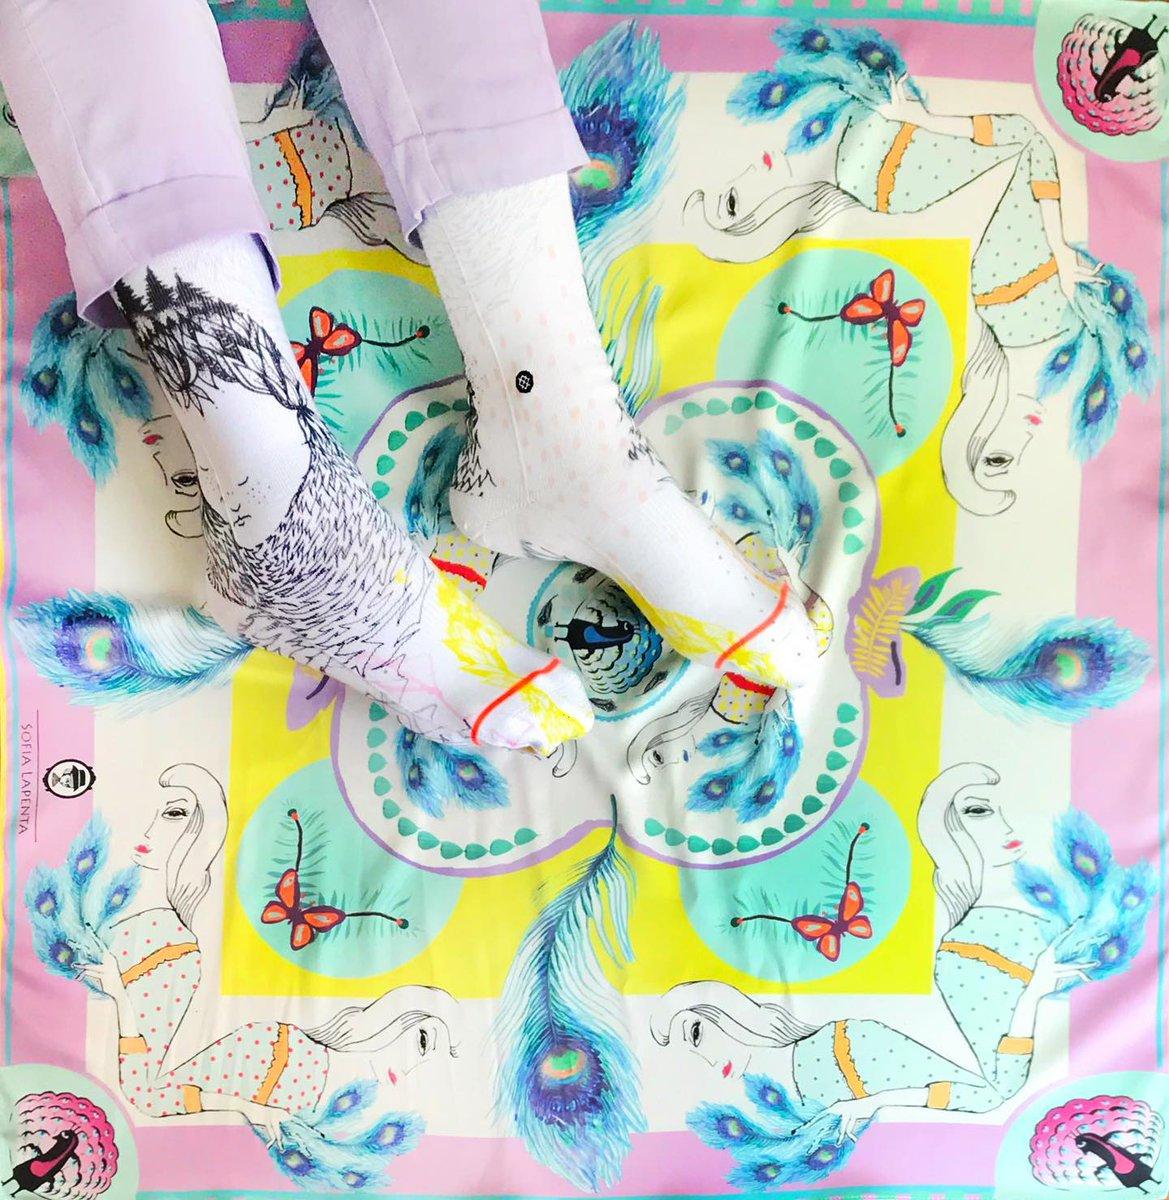 Más power que este pañuelo Plumas Amarillo? Les gustan estos colores???  . . . . . . . . . . stancesocks stancemuse  #sofialapenta #estampasparalupa #animallover #catlover #fashion #fashiondesign #drawing  #surrealism #arte #sketchbook  #work #artwork #studio #frenchstyle # https://t.co/U7ASpJPrNt